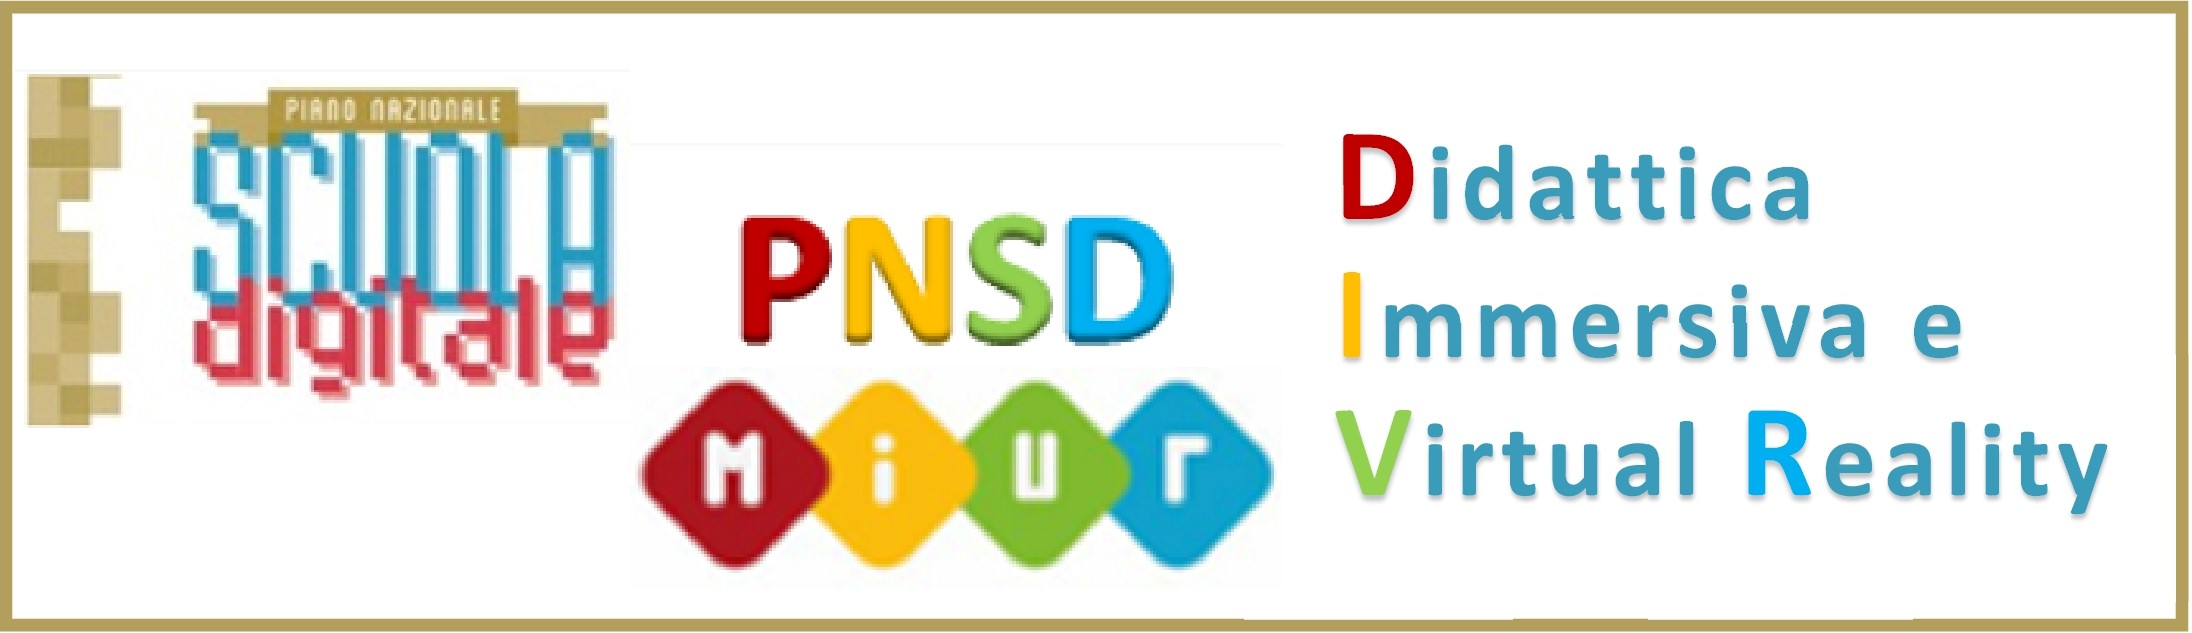 PNSD-Didattica Immersiva e Virtual Reality